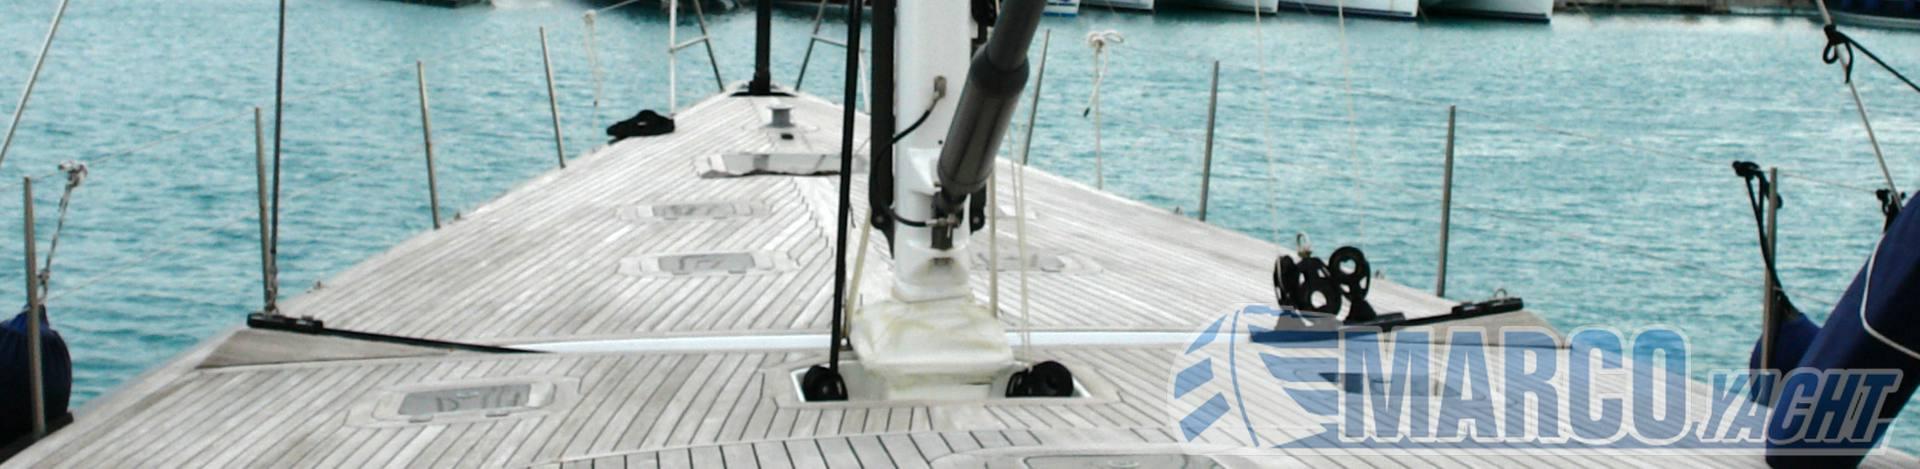 Wally 77 Sail cruiser